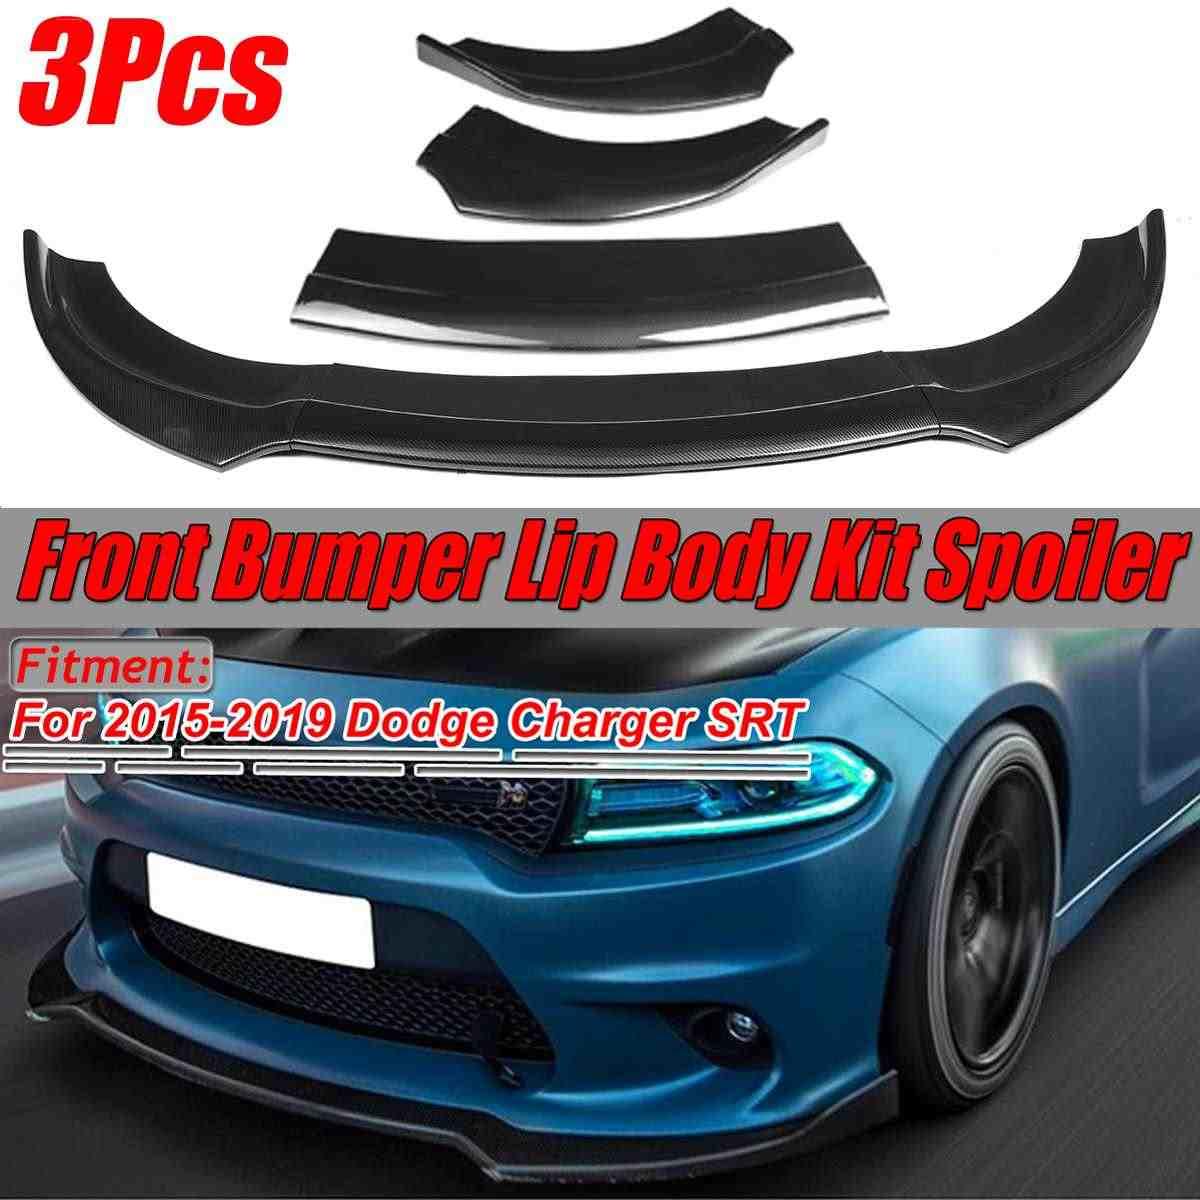 New Carbon Fiber Look Black Car Front Bumper Splitter Lip Body Kit Spoiler Diffuser For Dodge For Charger Srt 2015 2019 Bumpers Aliexpress